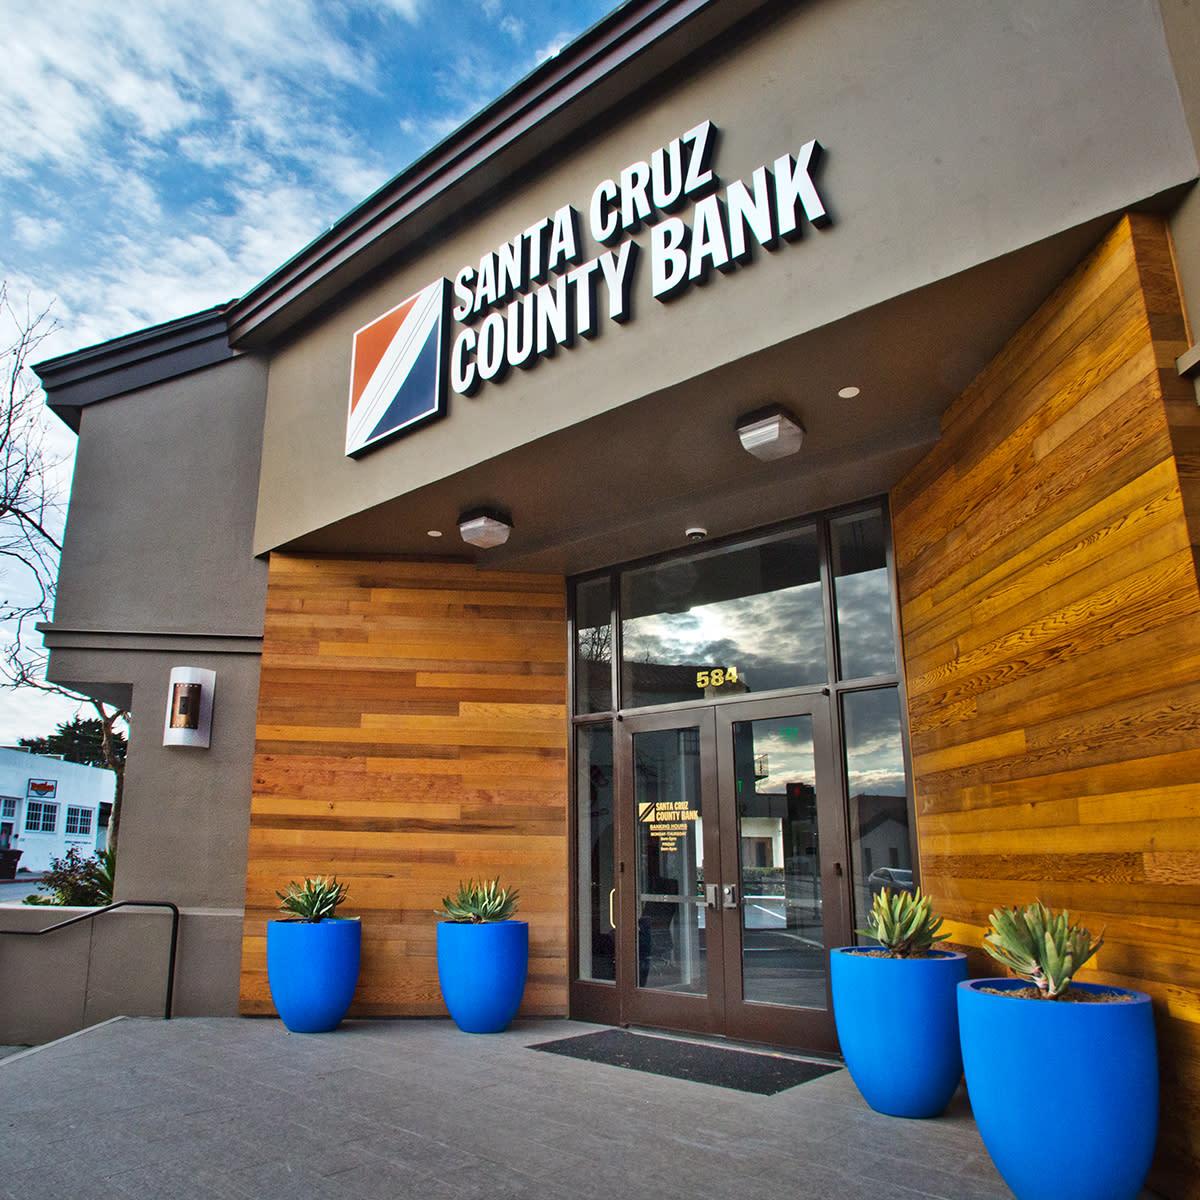 Exterior image of the entrance of Santa Cruz County Bank, Monterey Branch